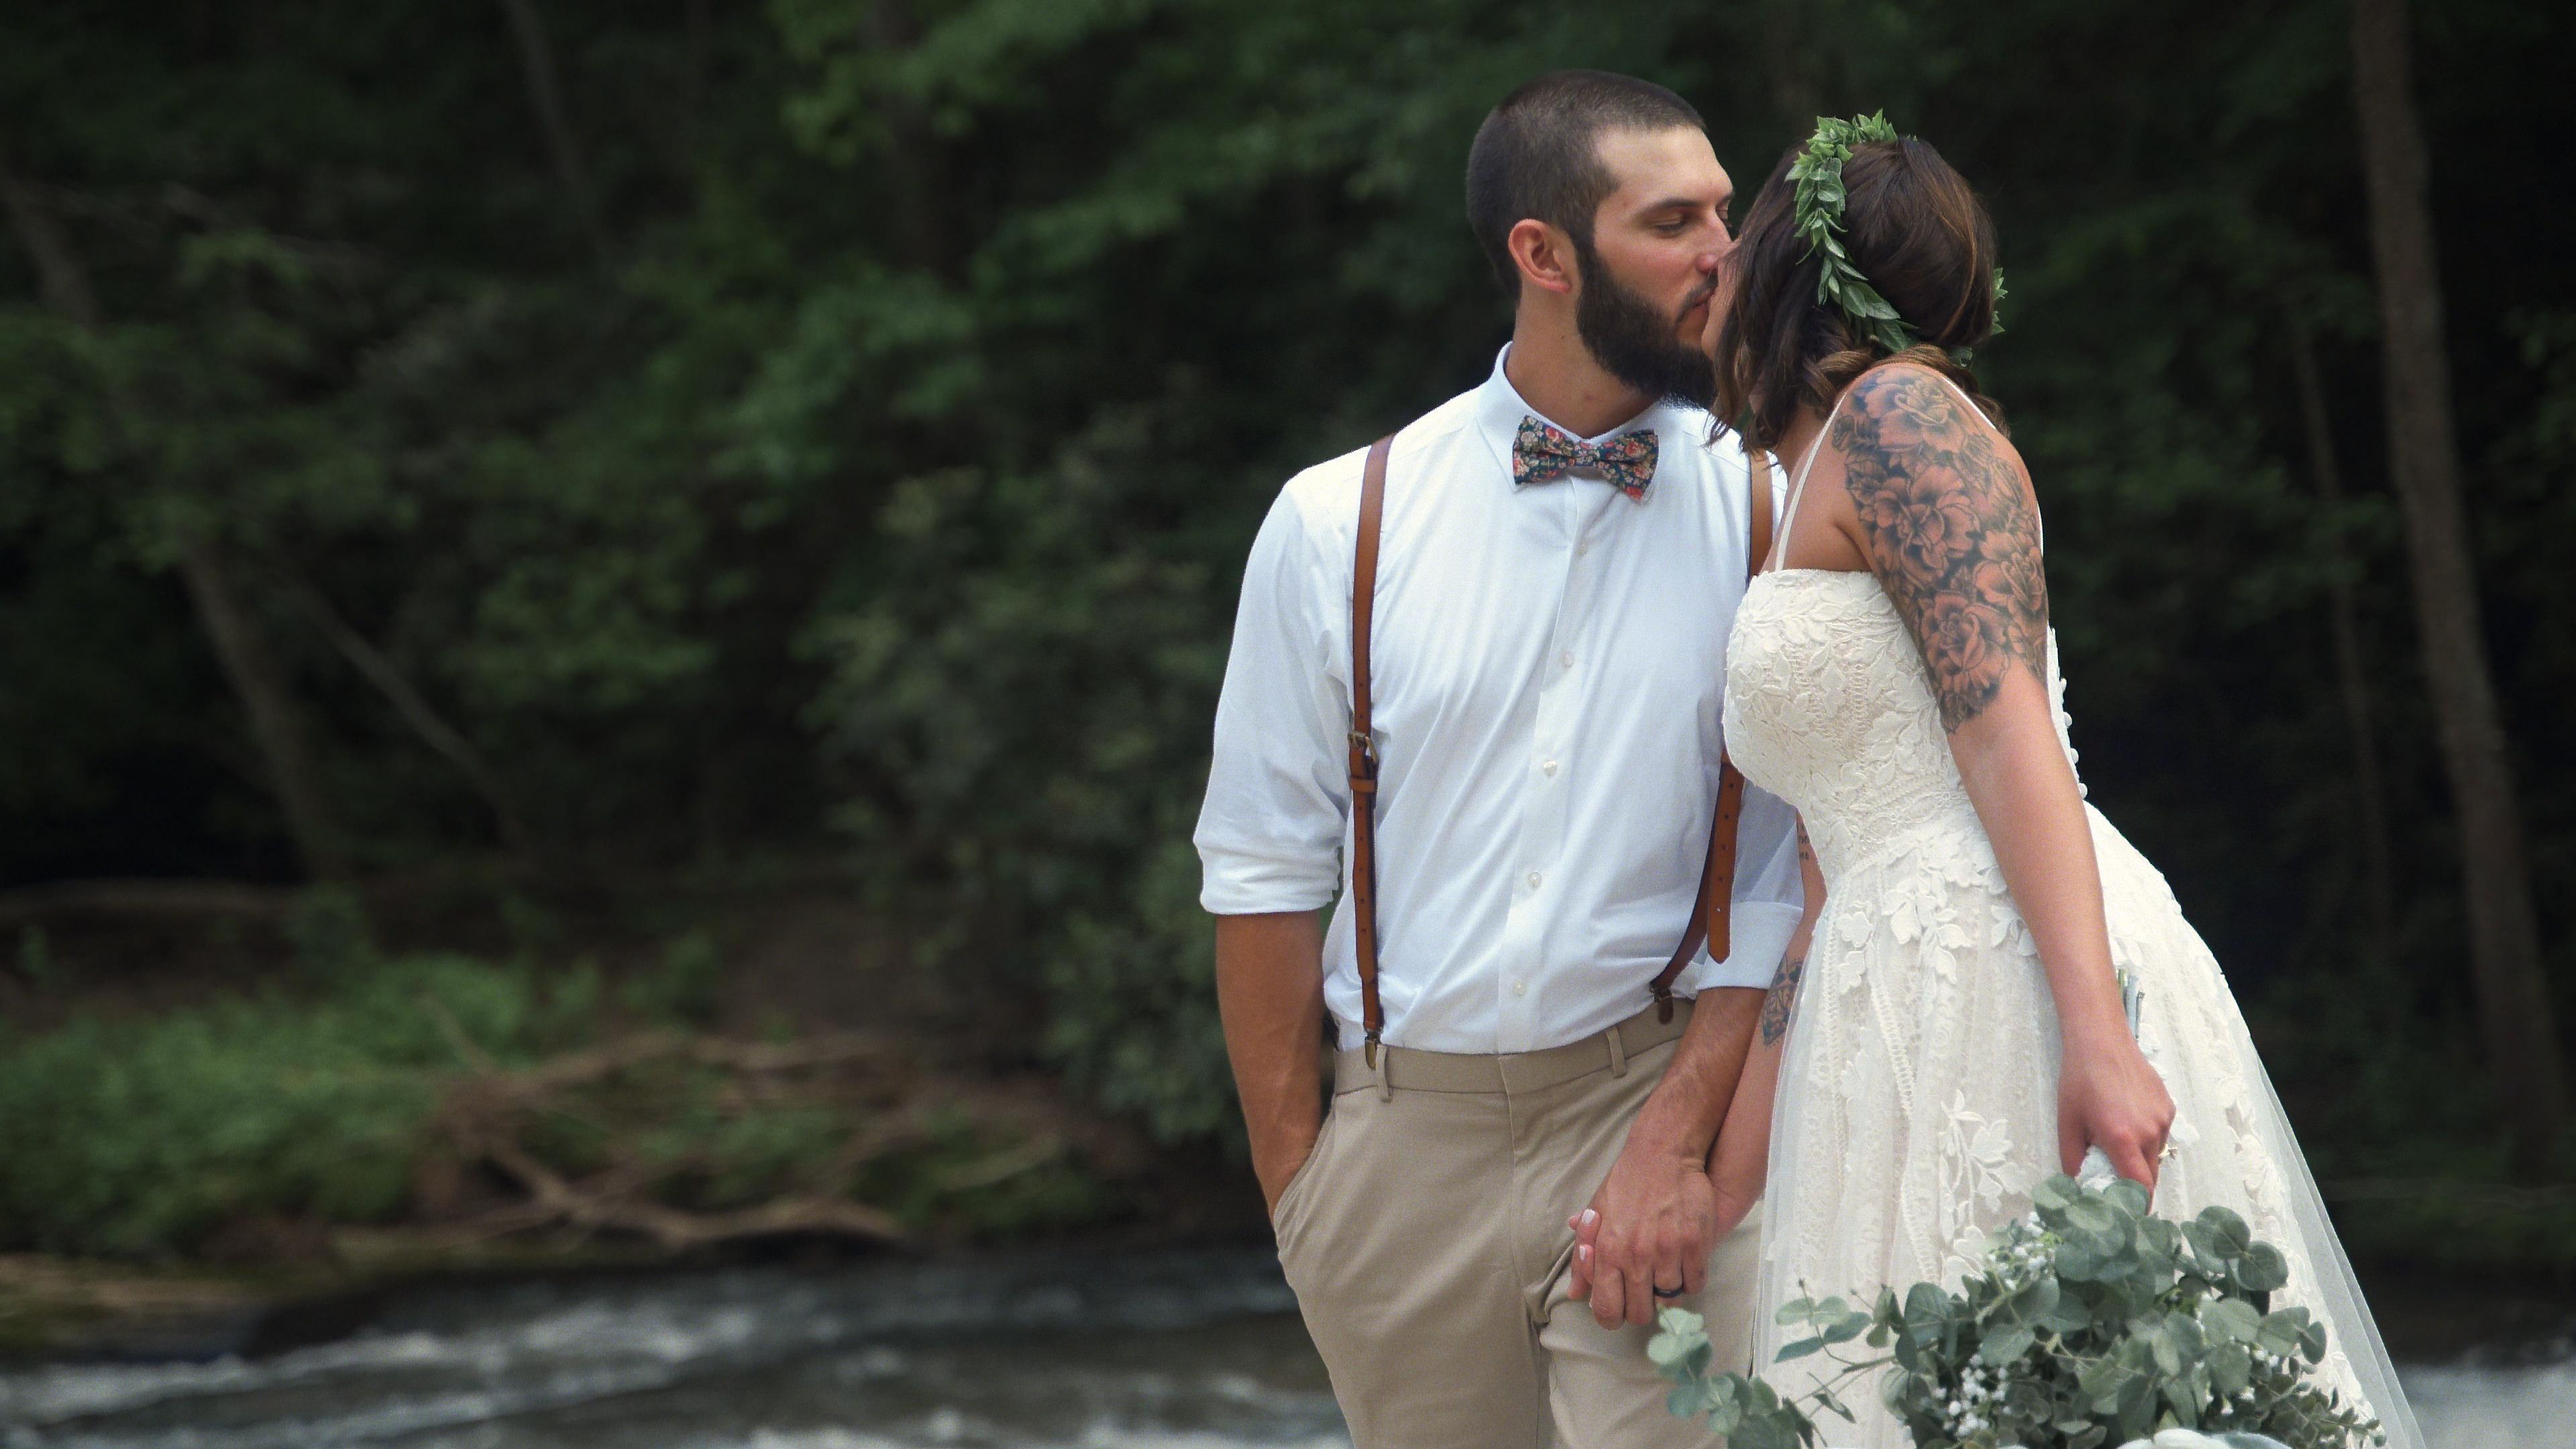 Taylor + Bryan | Elkin, North Carolina | Elkin Creek Vineyard